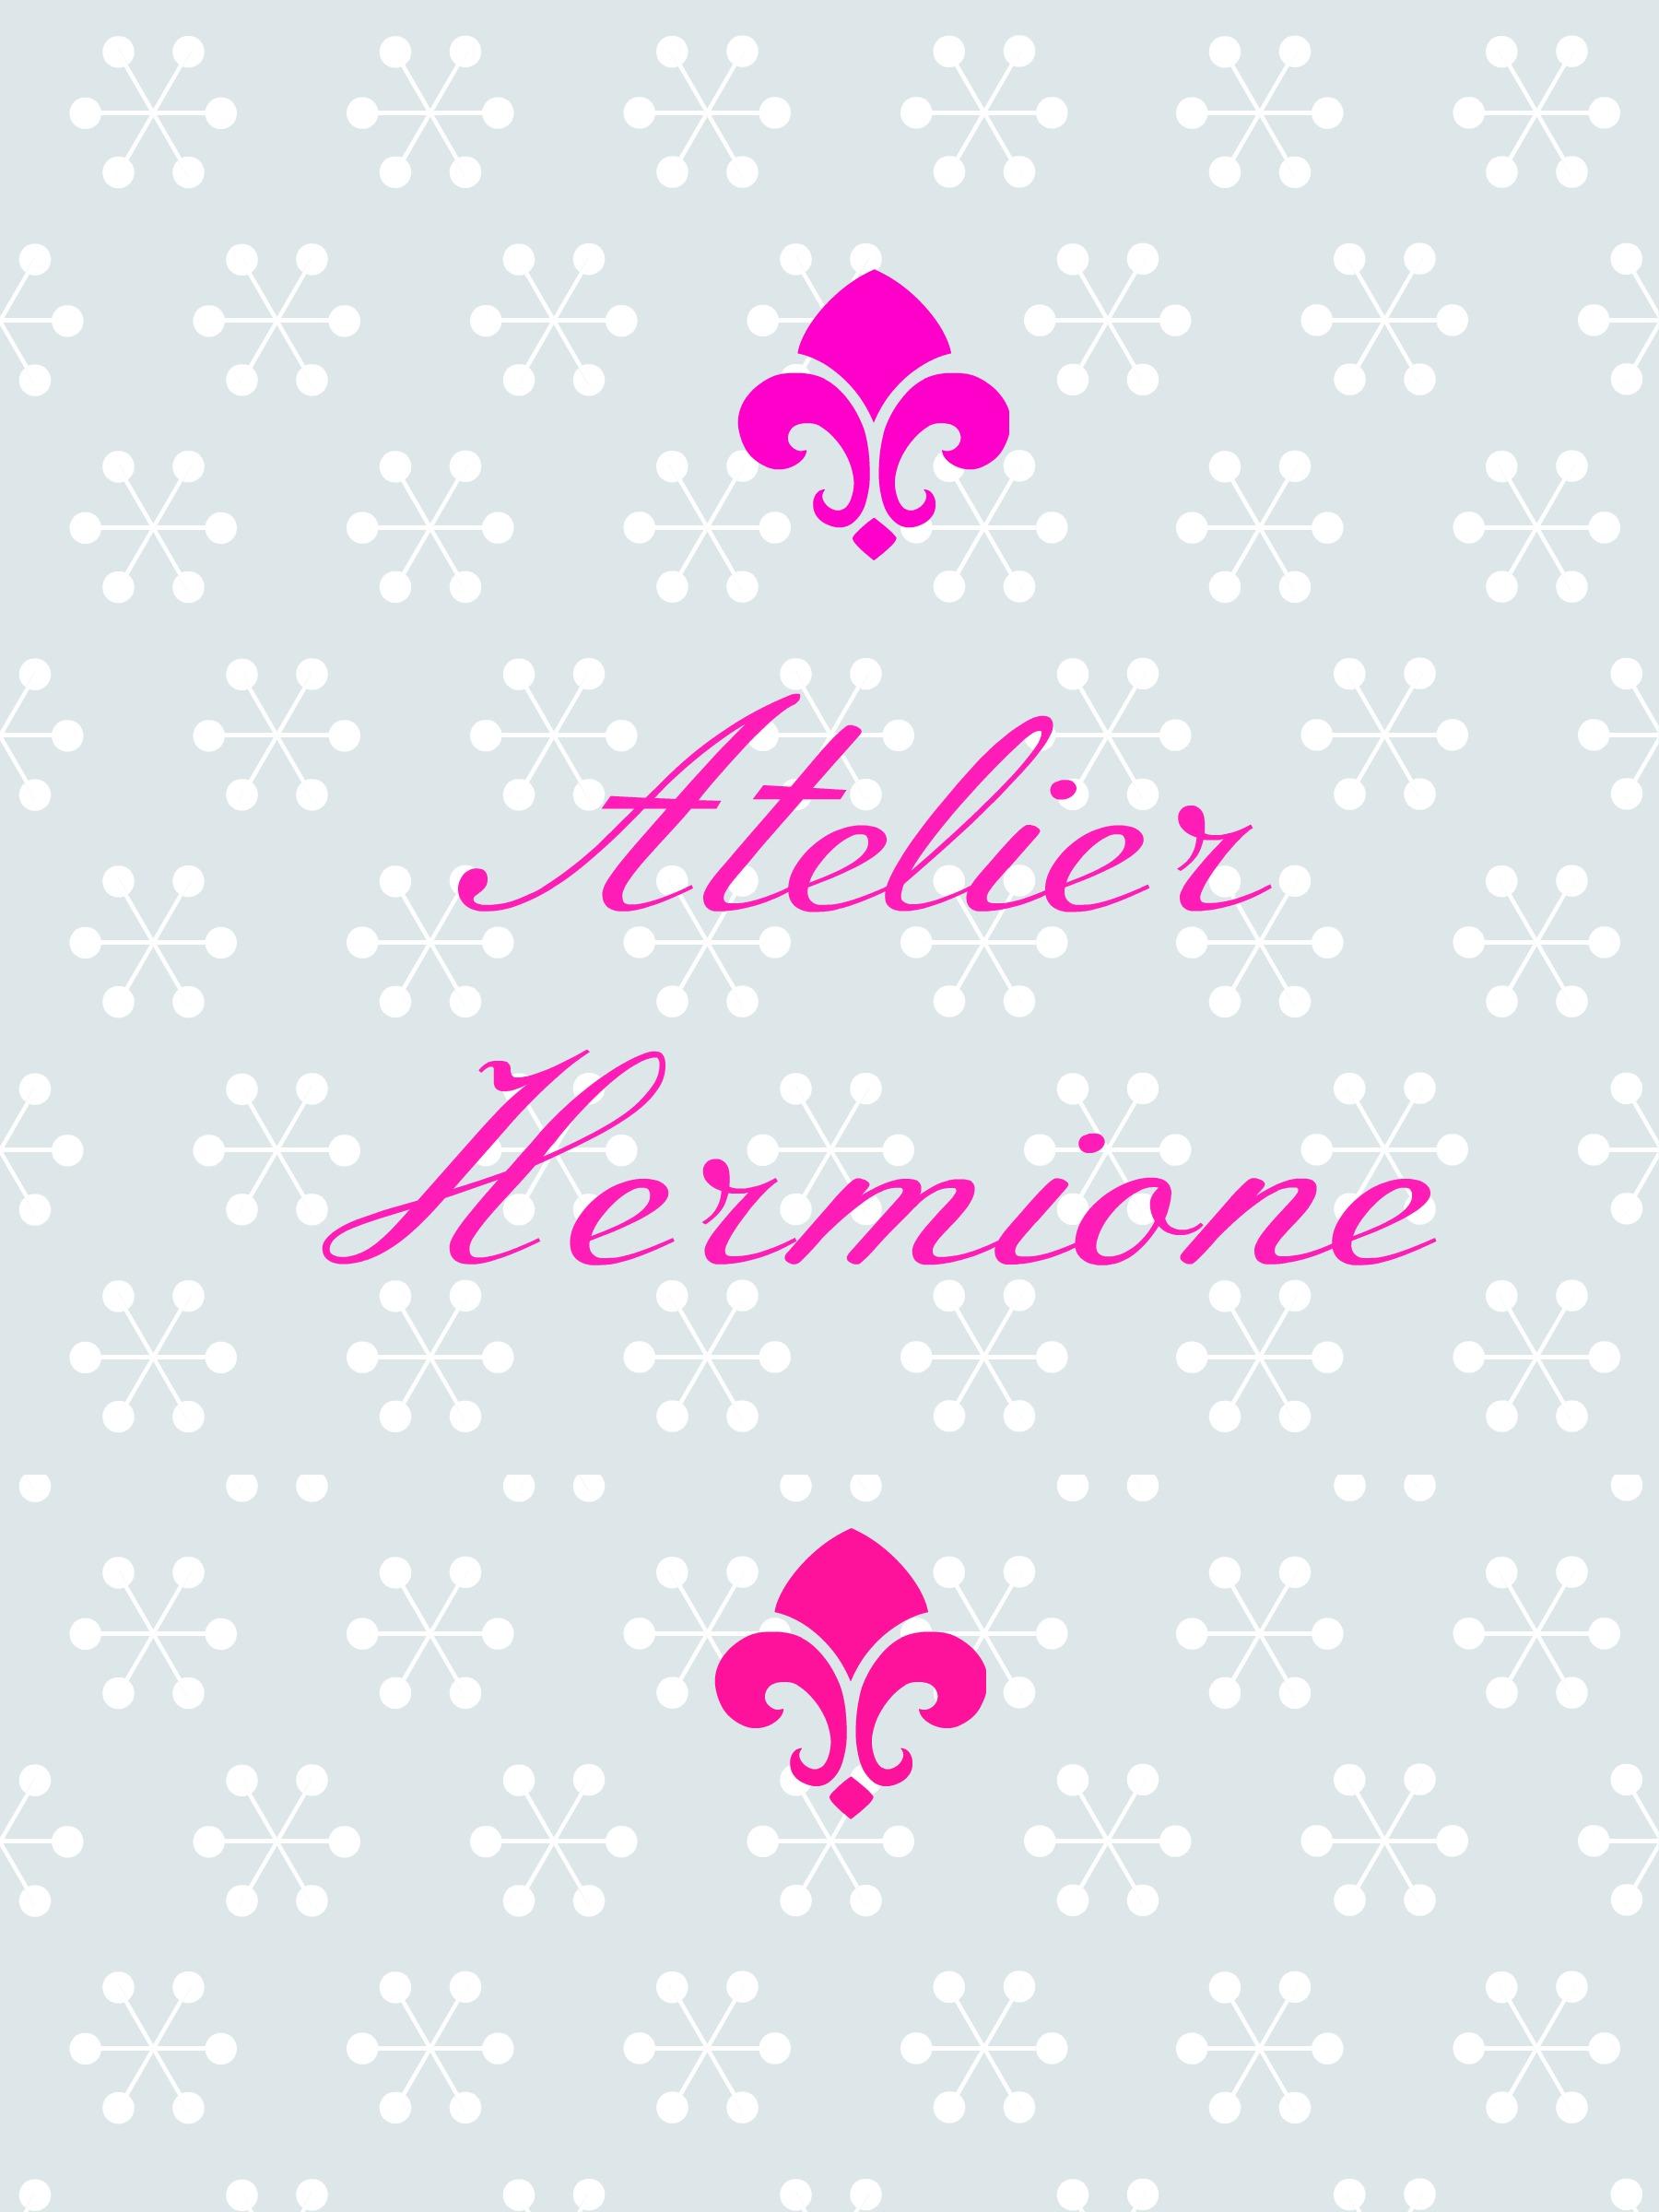 Atelier Hermione